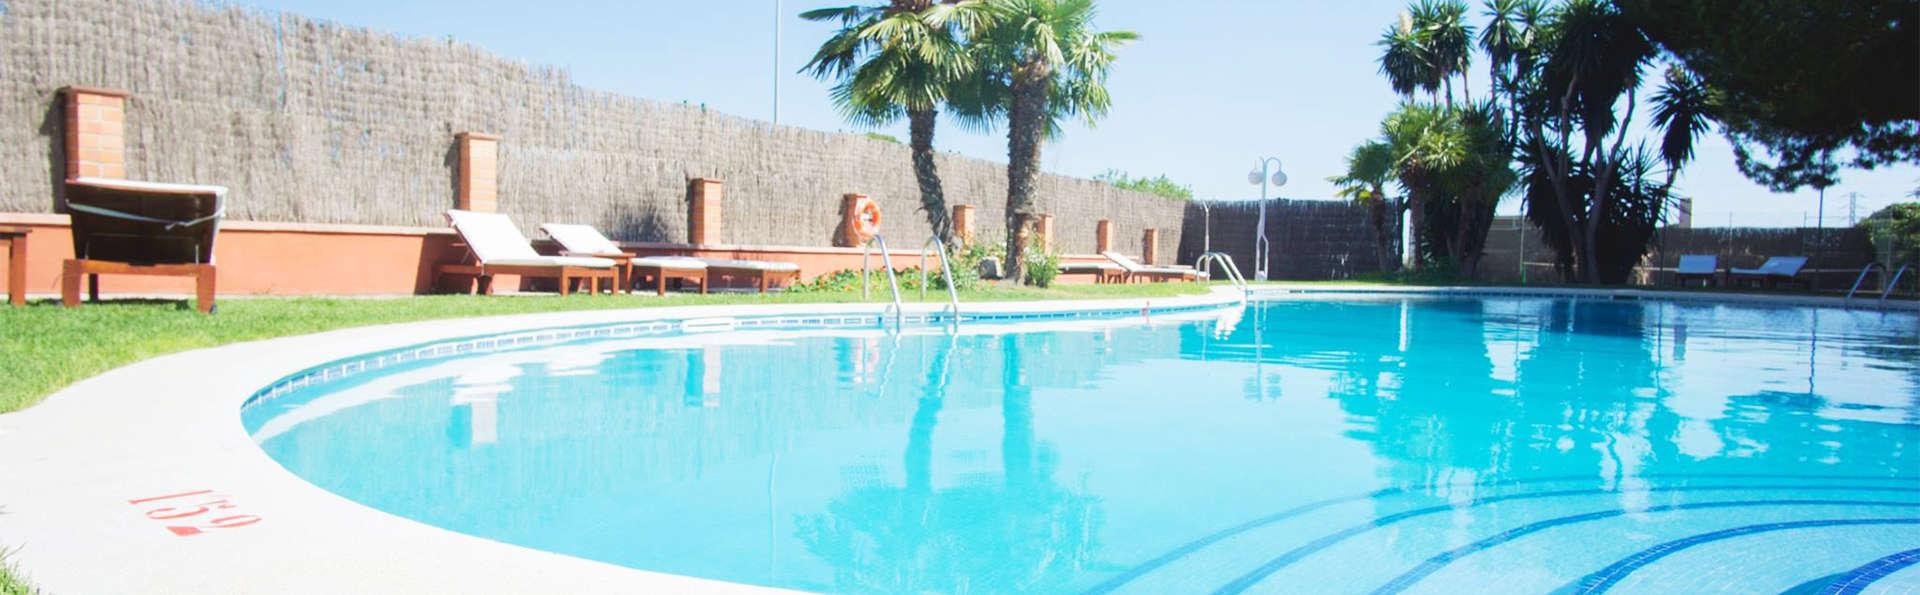 Hotel Felix - EDIT_pool5.jpg